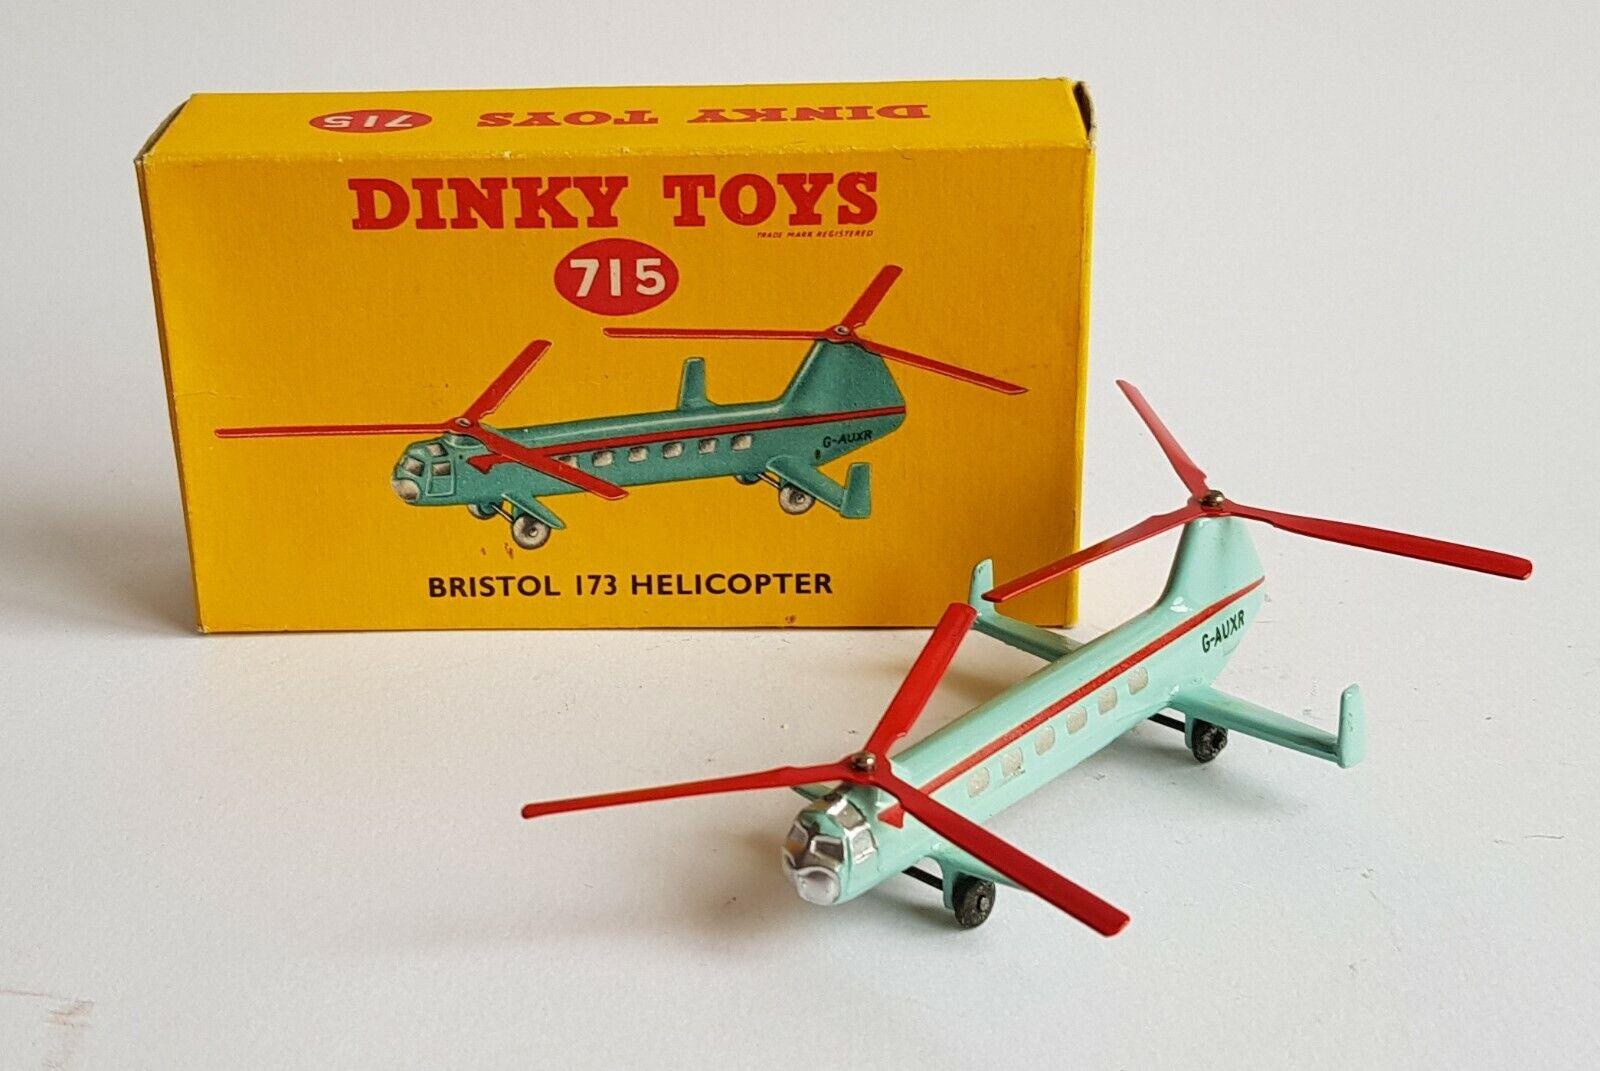 Mycket sällsynta Dinky leksaks No. 715, Bristol 173 Helicopter, - Superb Mint Condition.